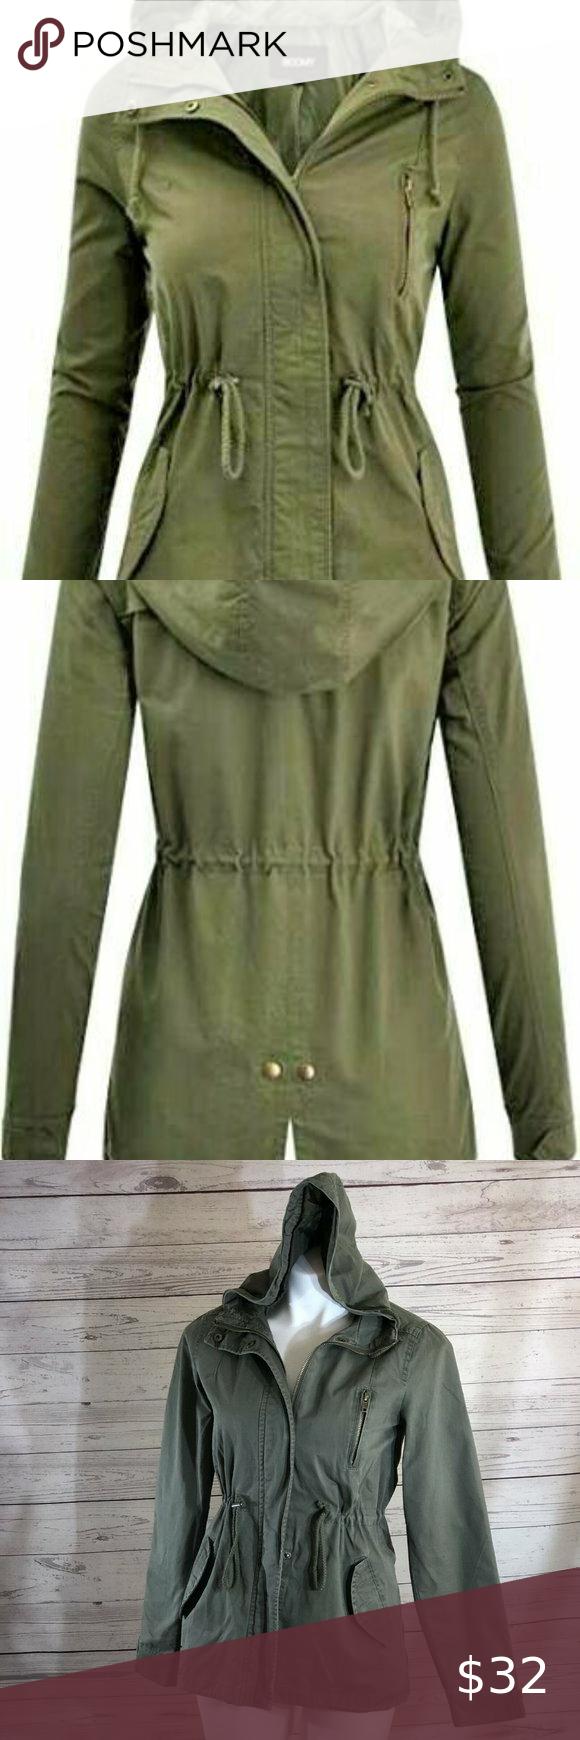 Ambiance Womens Size S Safari Military Jacket Lightweight Anorak Jacket Coats Jackets Women Olive Cargo Jacket [ 1740 x 580 Pixel ]